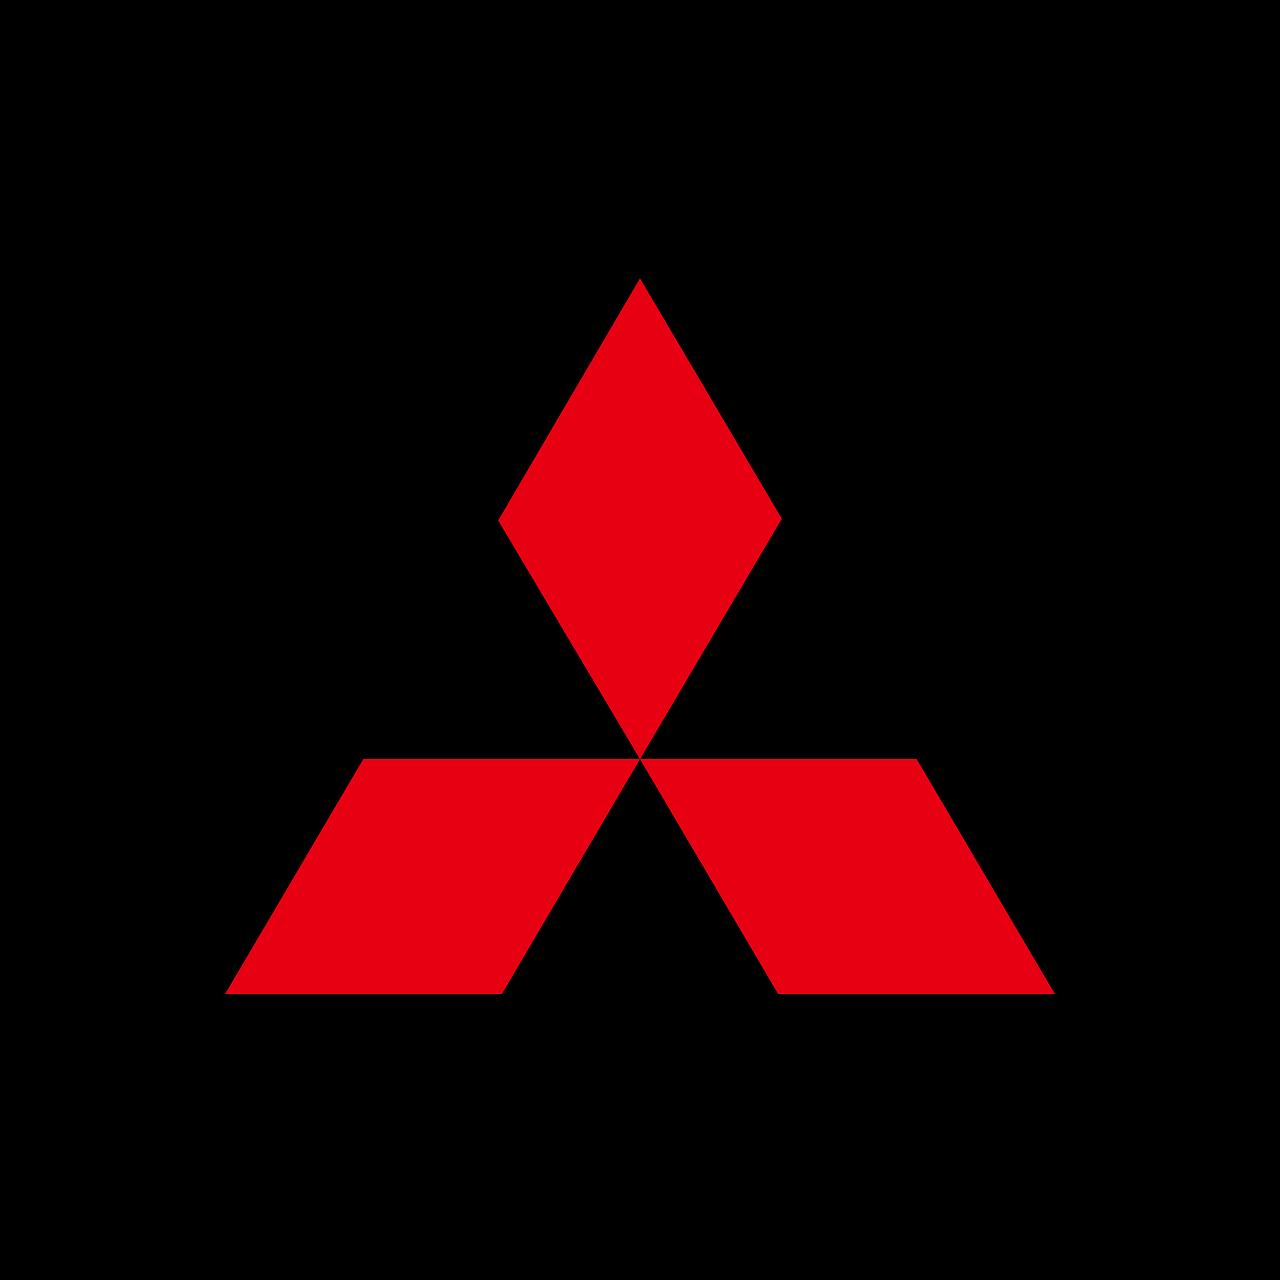 Mitsubishi Designer Yataro Iwasaki Firm In House Year 1870 With Images Simple Logo Design Logo Design History Logo